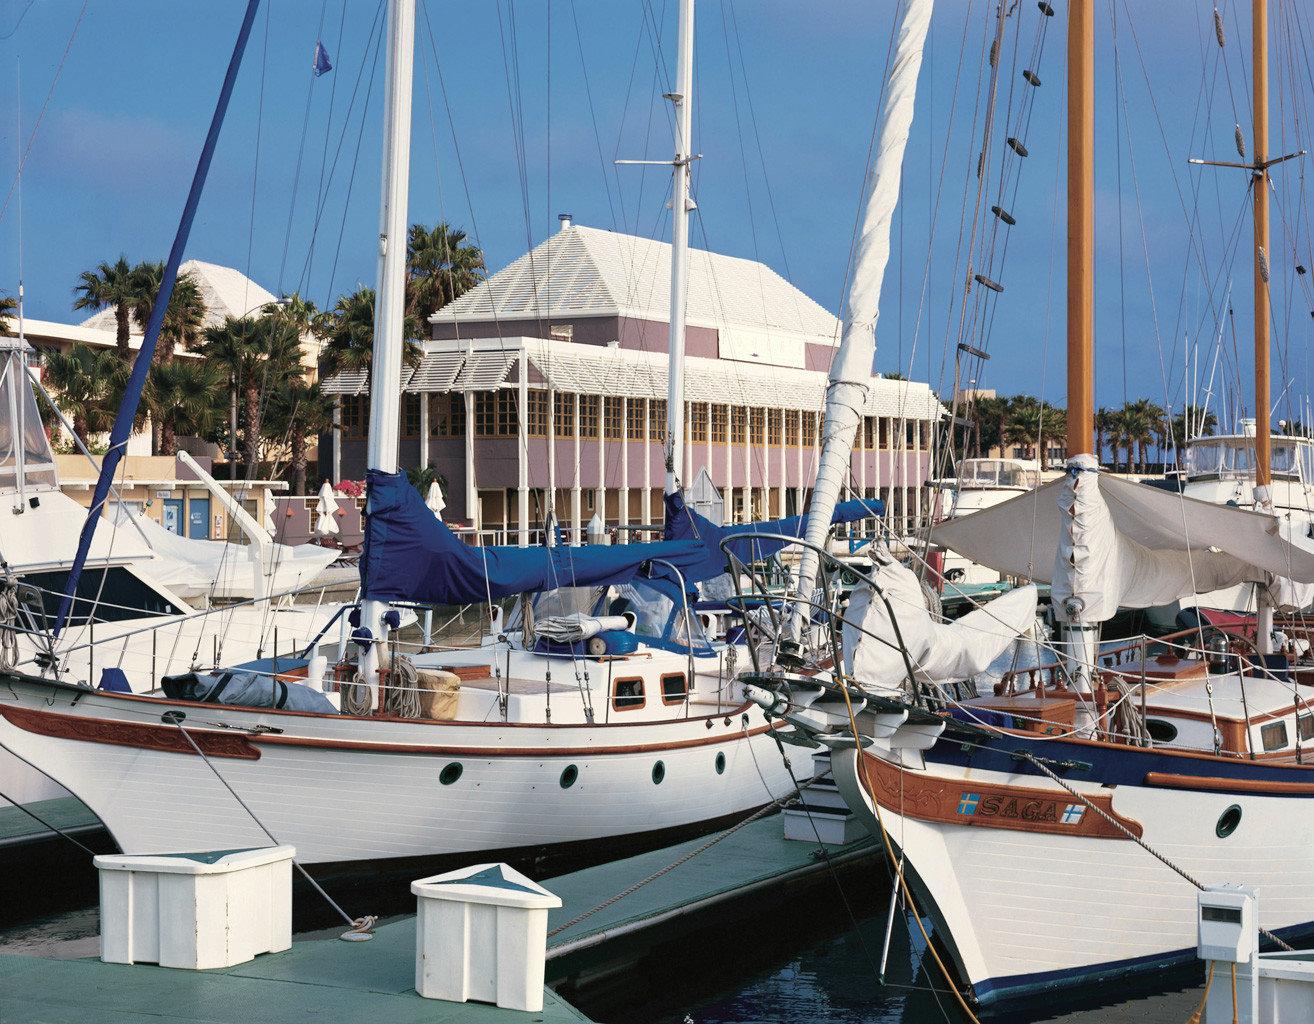 Boat Eco Family Outdoor Activities Play Scenic views Waterfront sky water vehicle marina docked sailboat dock sail yacht sailing watercraft Harbor sailing ship Sea mast ship tied